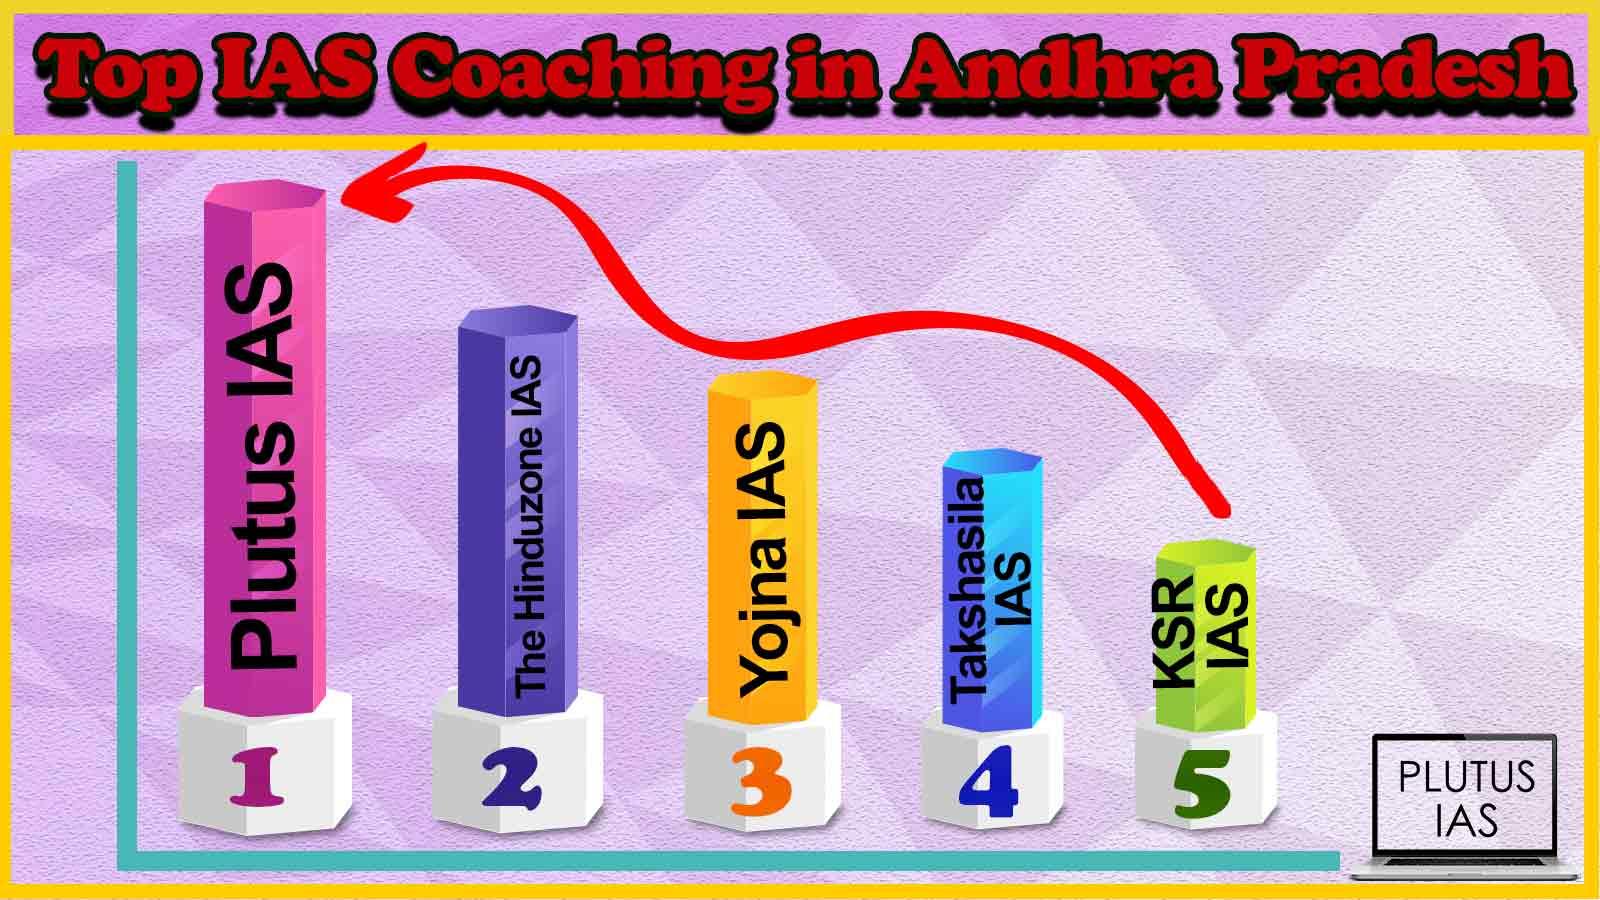 Top 10 IAS Coaching in Andhra Pradesh